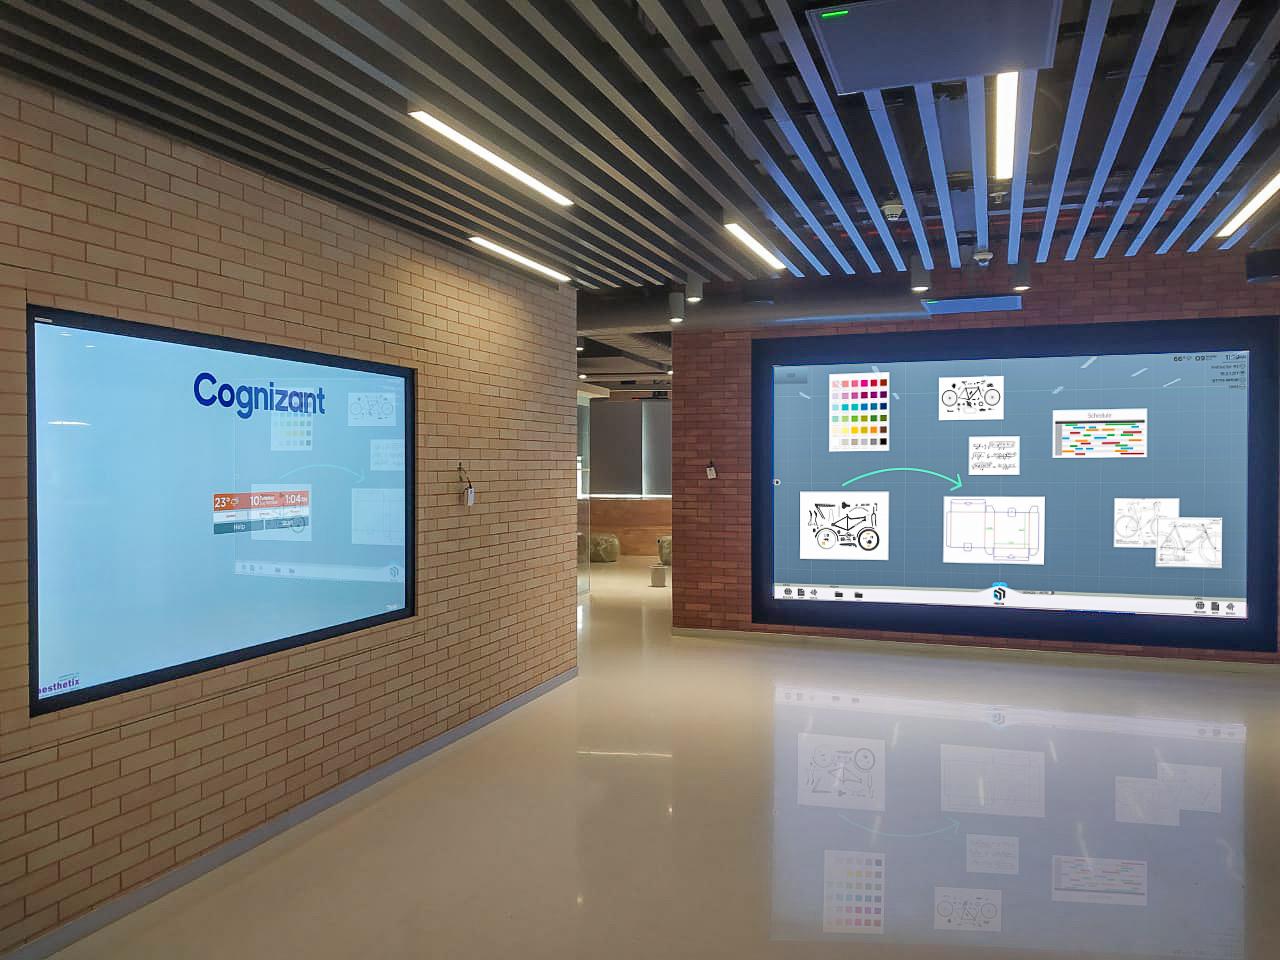 T1V-ThinkHub-BYOD-Collaboration-Cognizant-Pune-India-LED-Video-Walls-98 -Single-Panels-MultiSite-September-2019 (1)